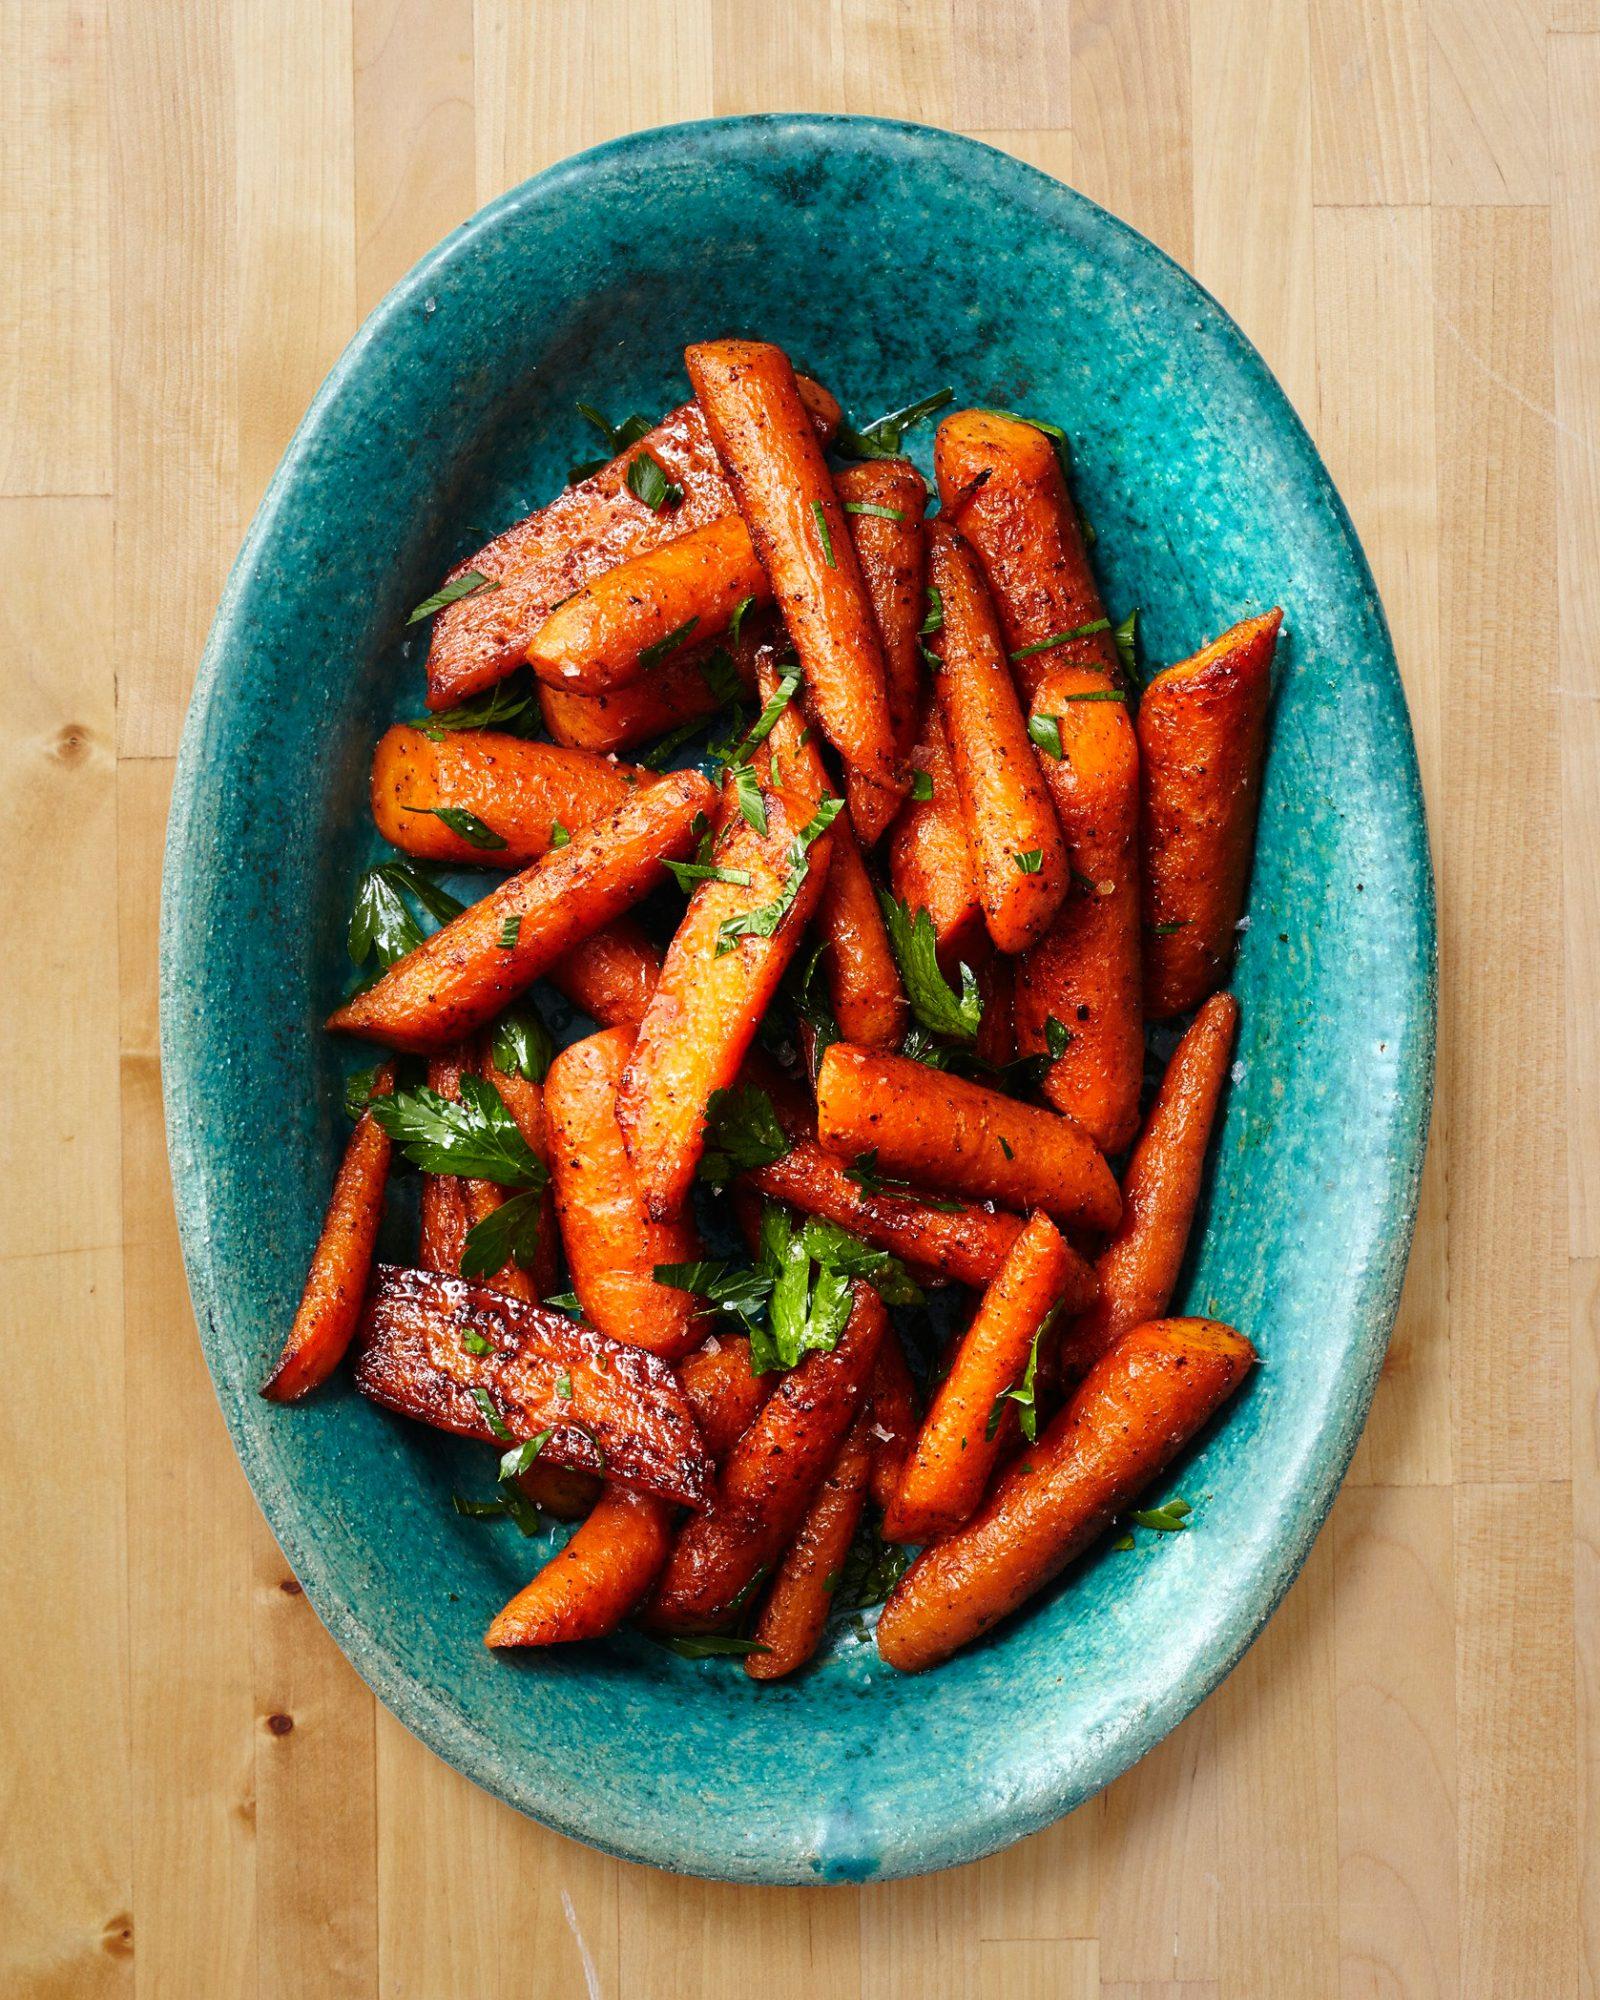 Roasted Carrots with Cumin Cinnamon